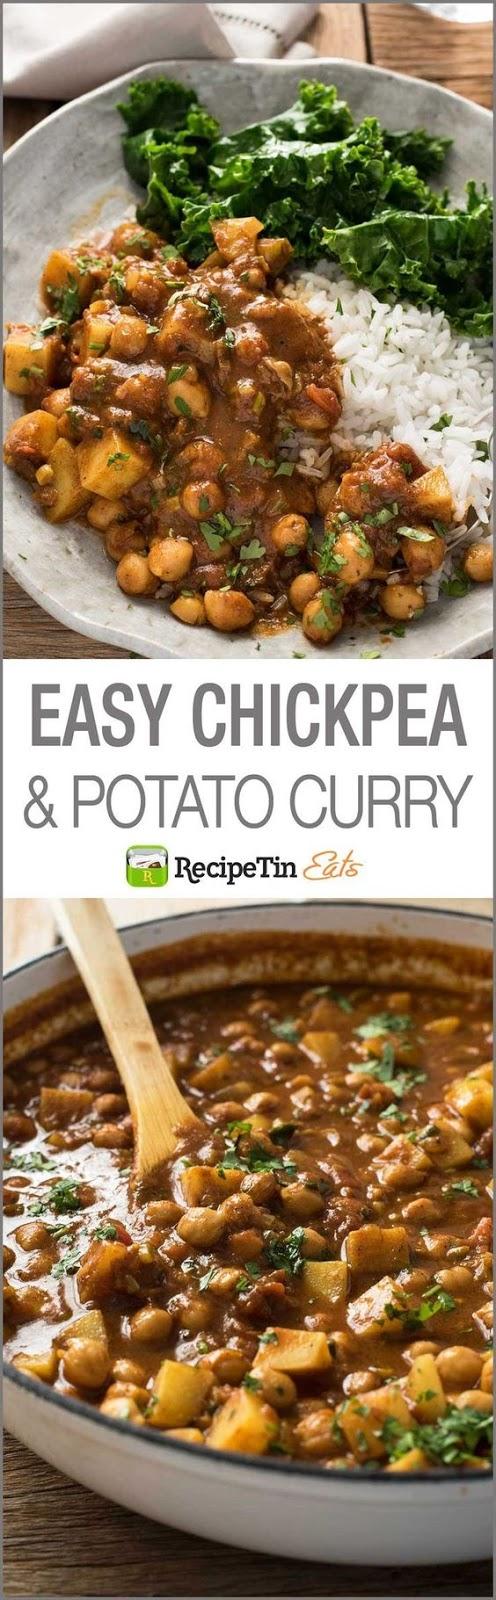 Easy Chickpea & Potato Curry